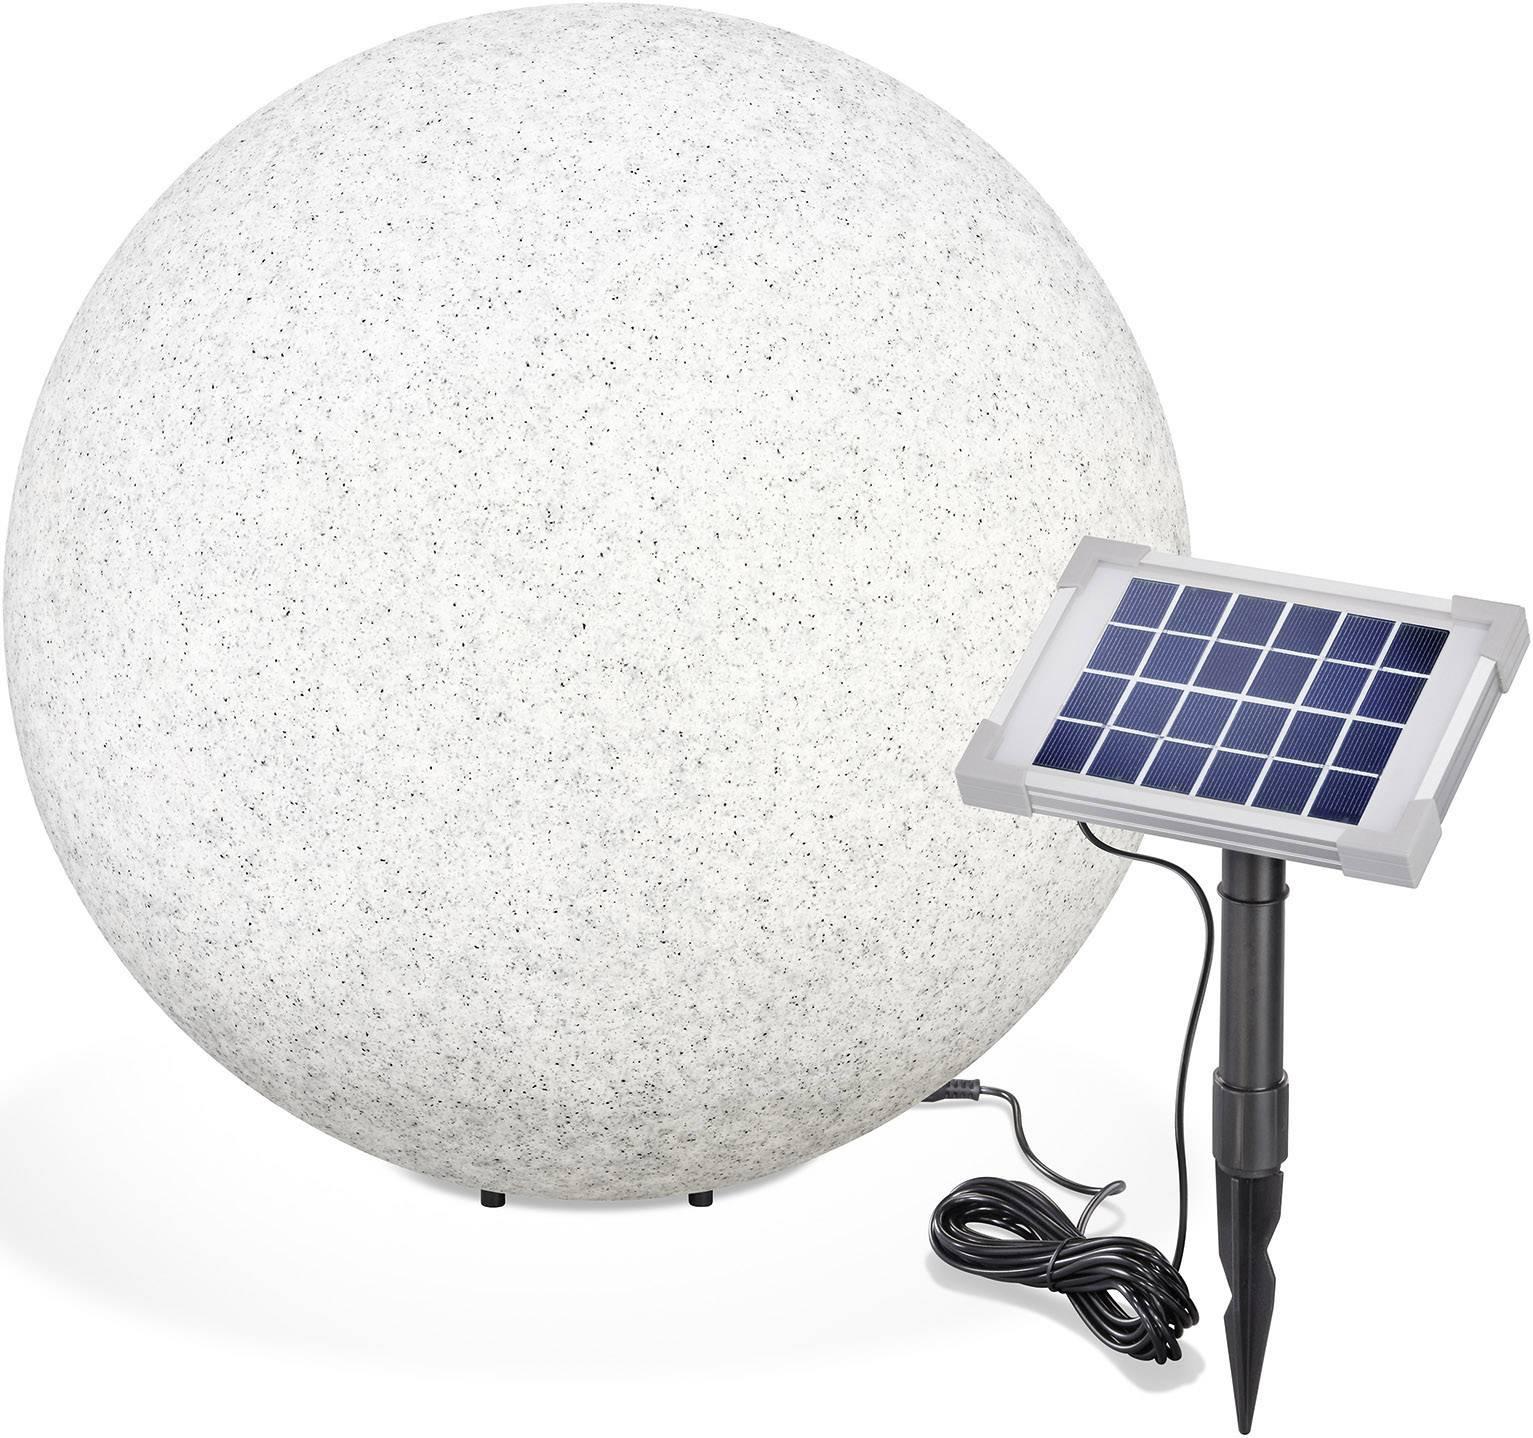 LED solárne dekoračné osvetlenie kameň Esotec Mega Stone 50 106022, IP65, sivá, RGB